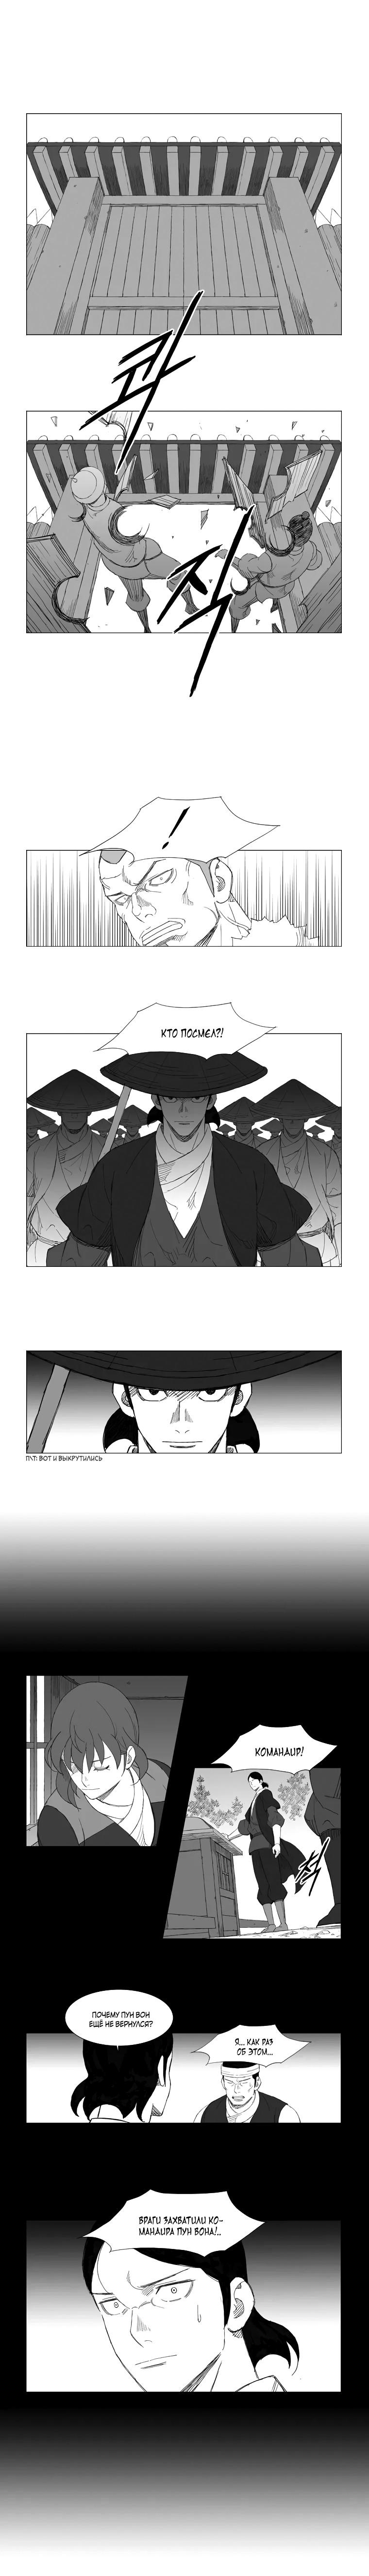 https://r1.ninemanga.com/comics/pic2/39/28263/416252/1532707585749.jpg Page 4